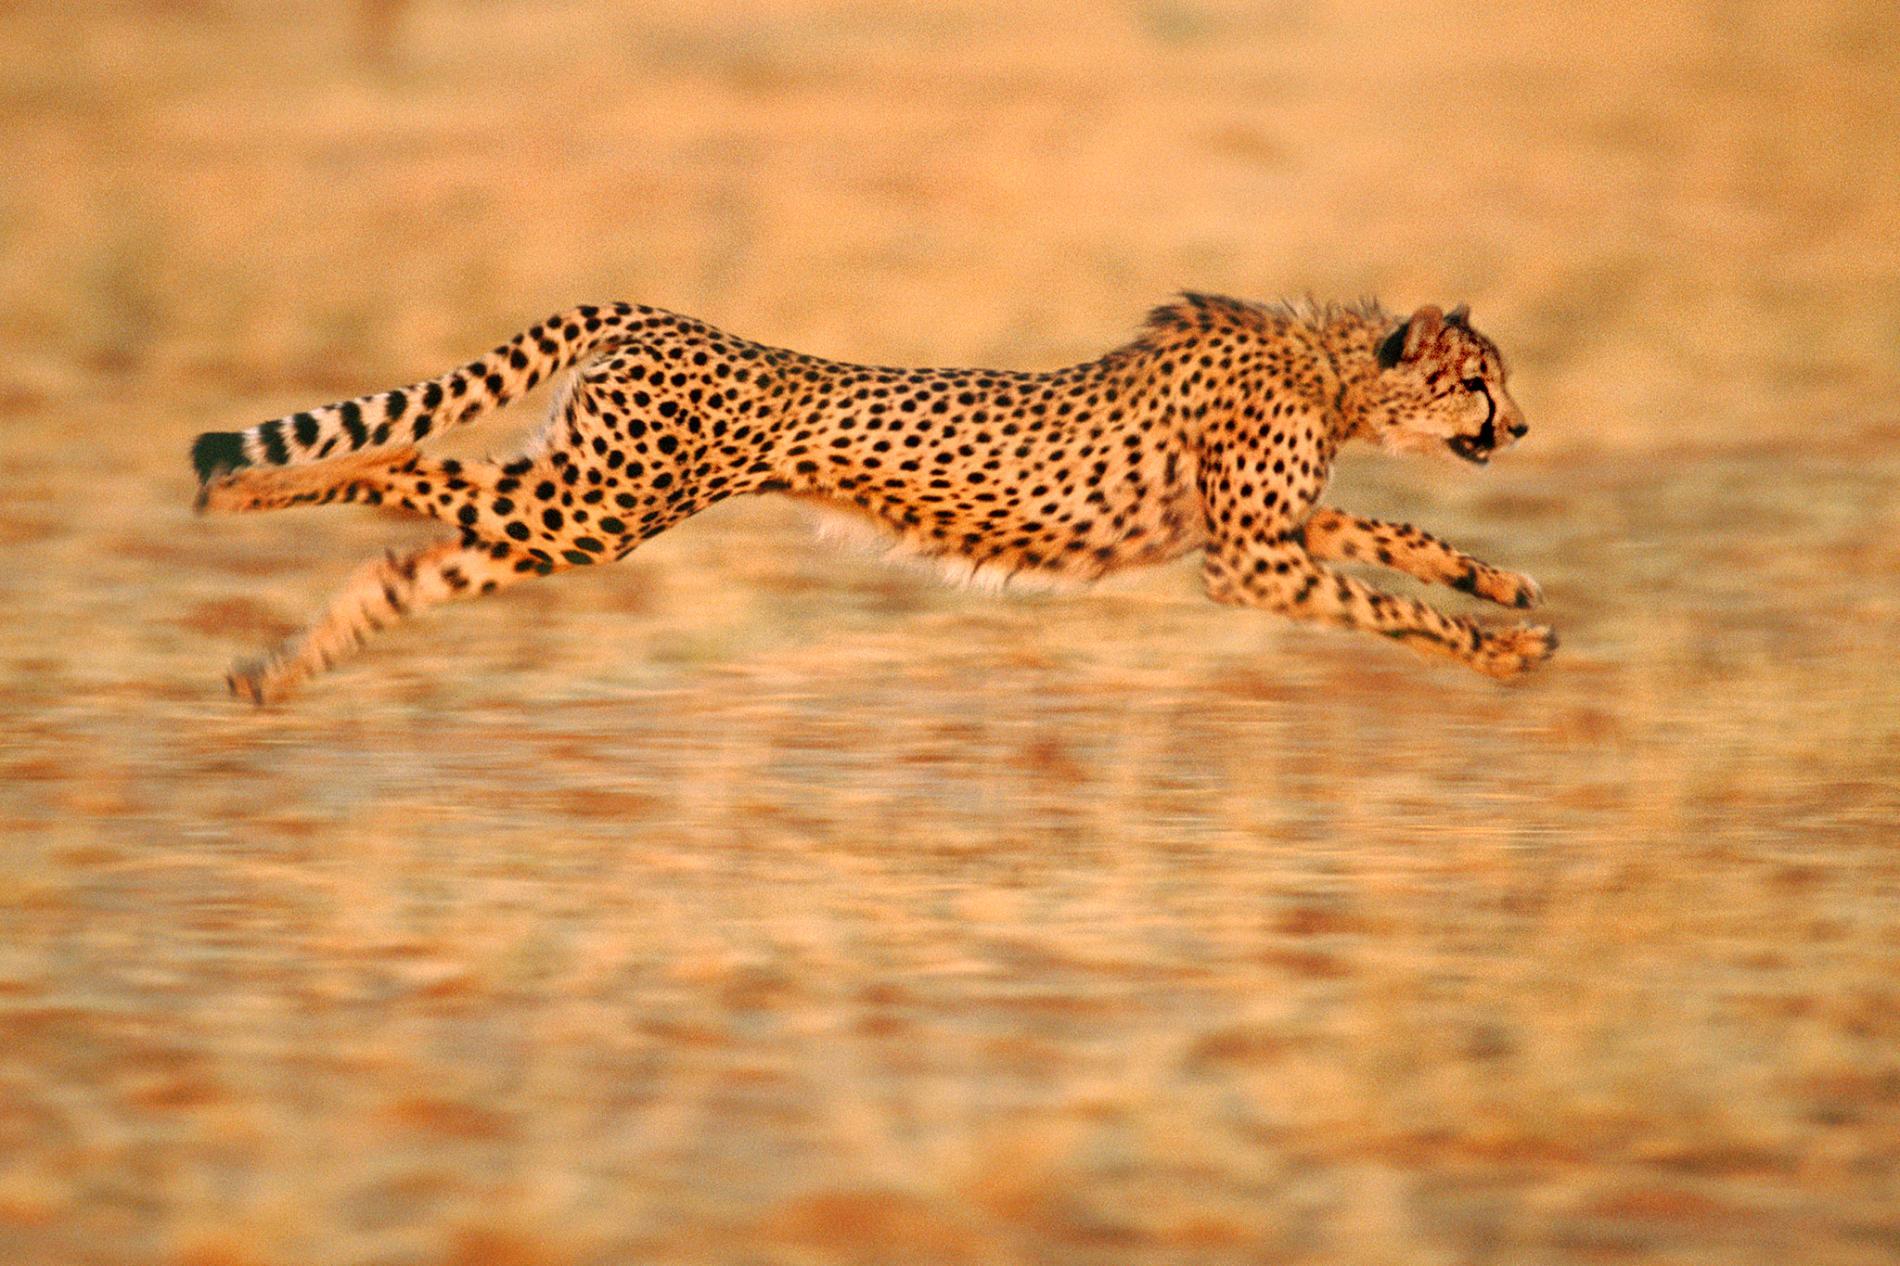 Animal photo